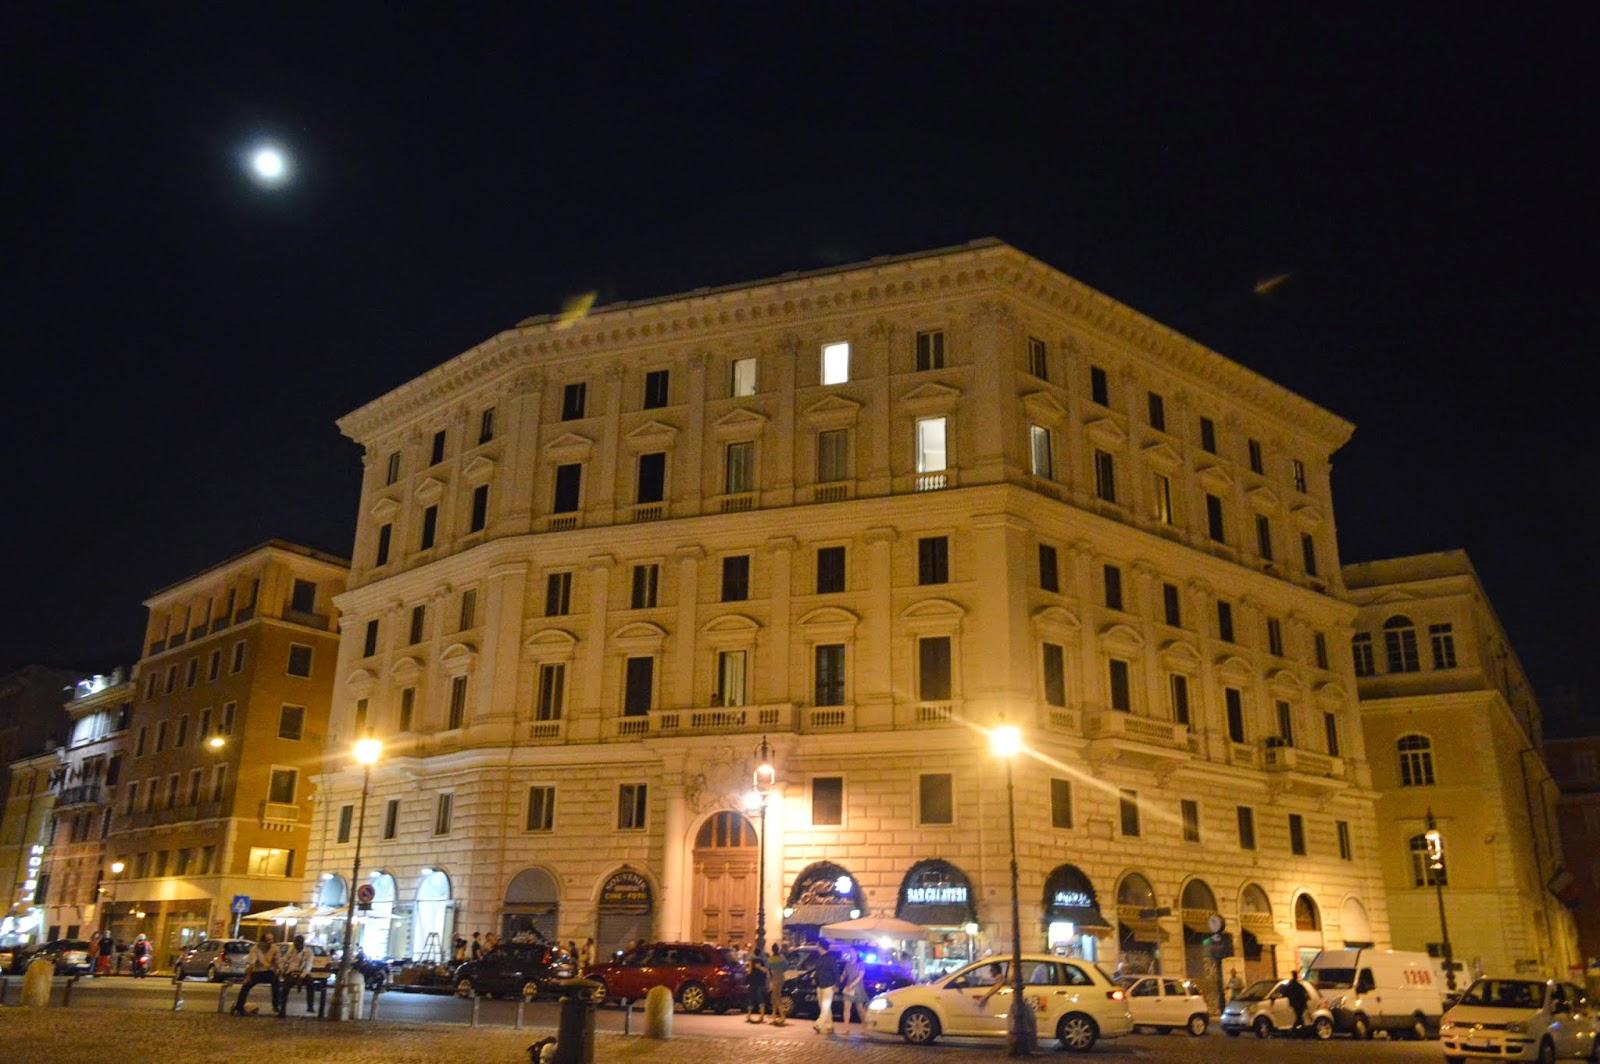 Dica de hospedagem barata em roma casa della amicizia - Casa chic roma ...